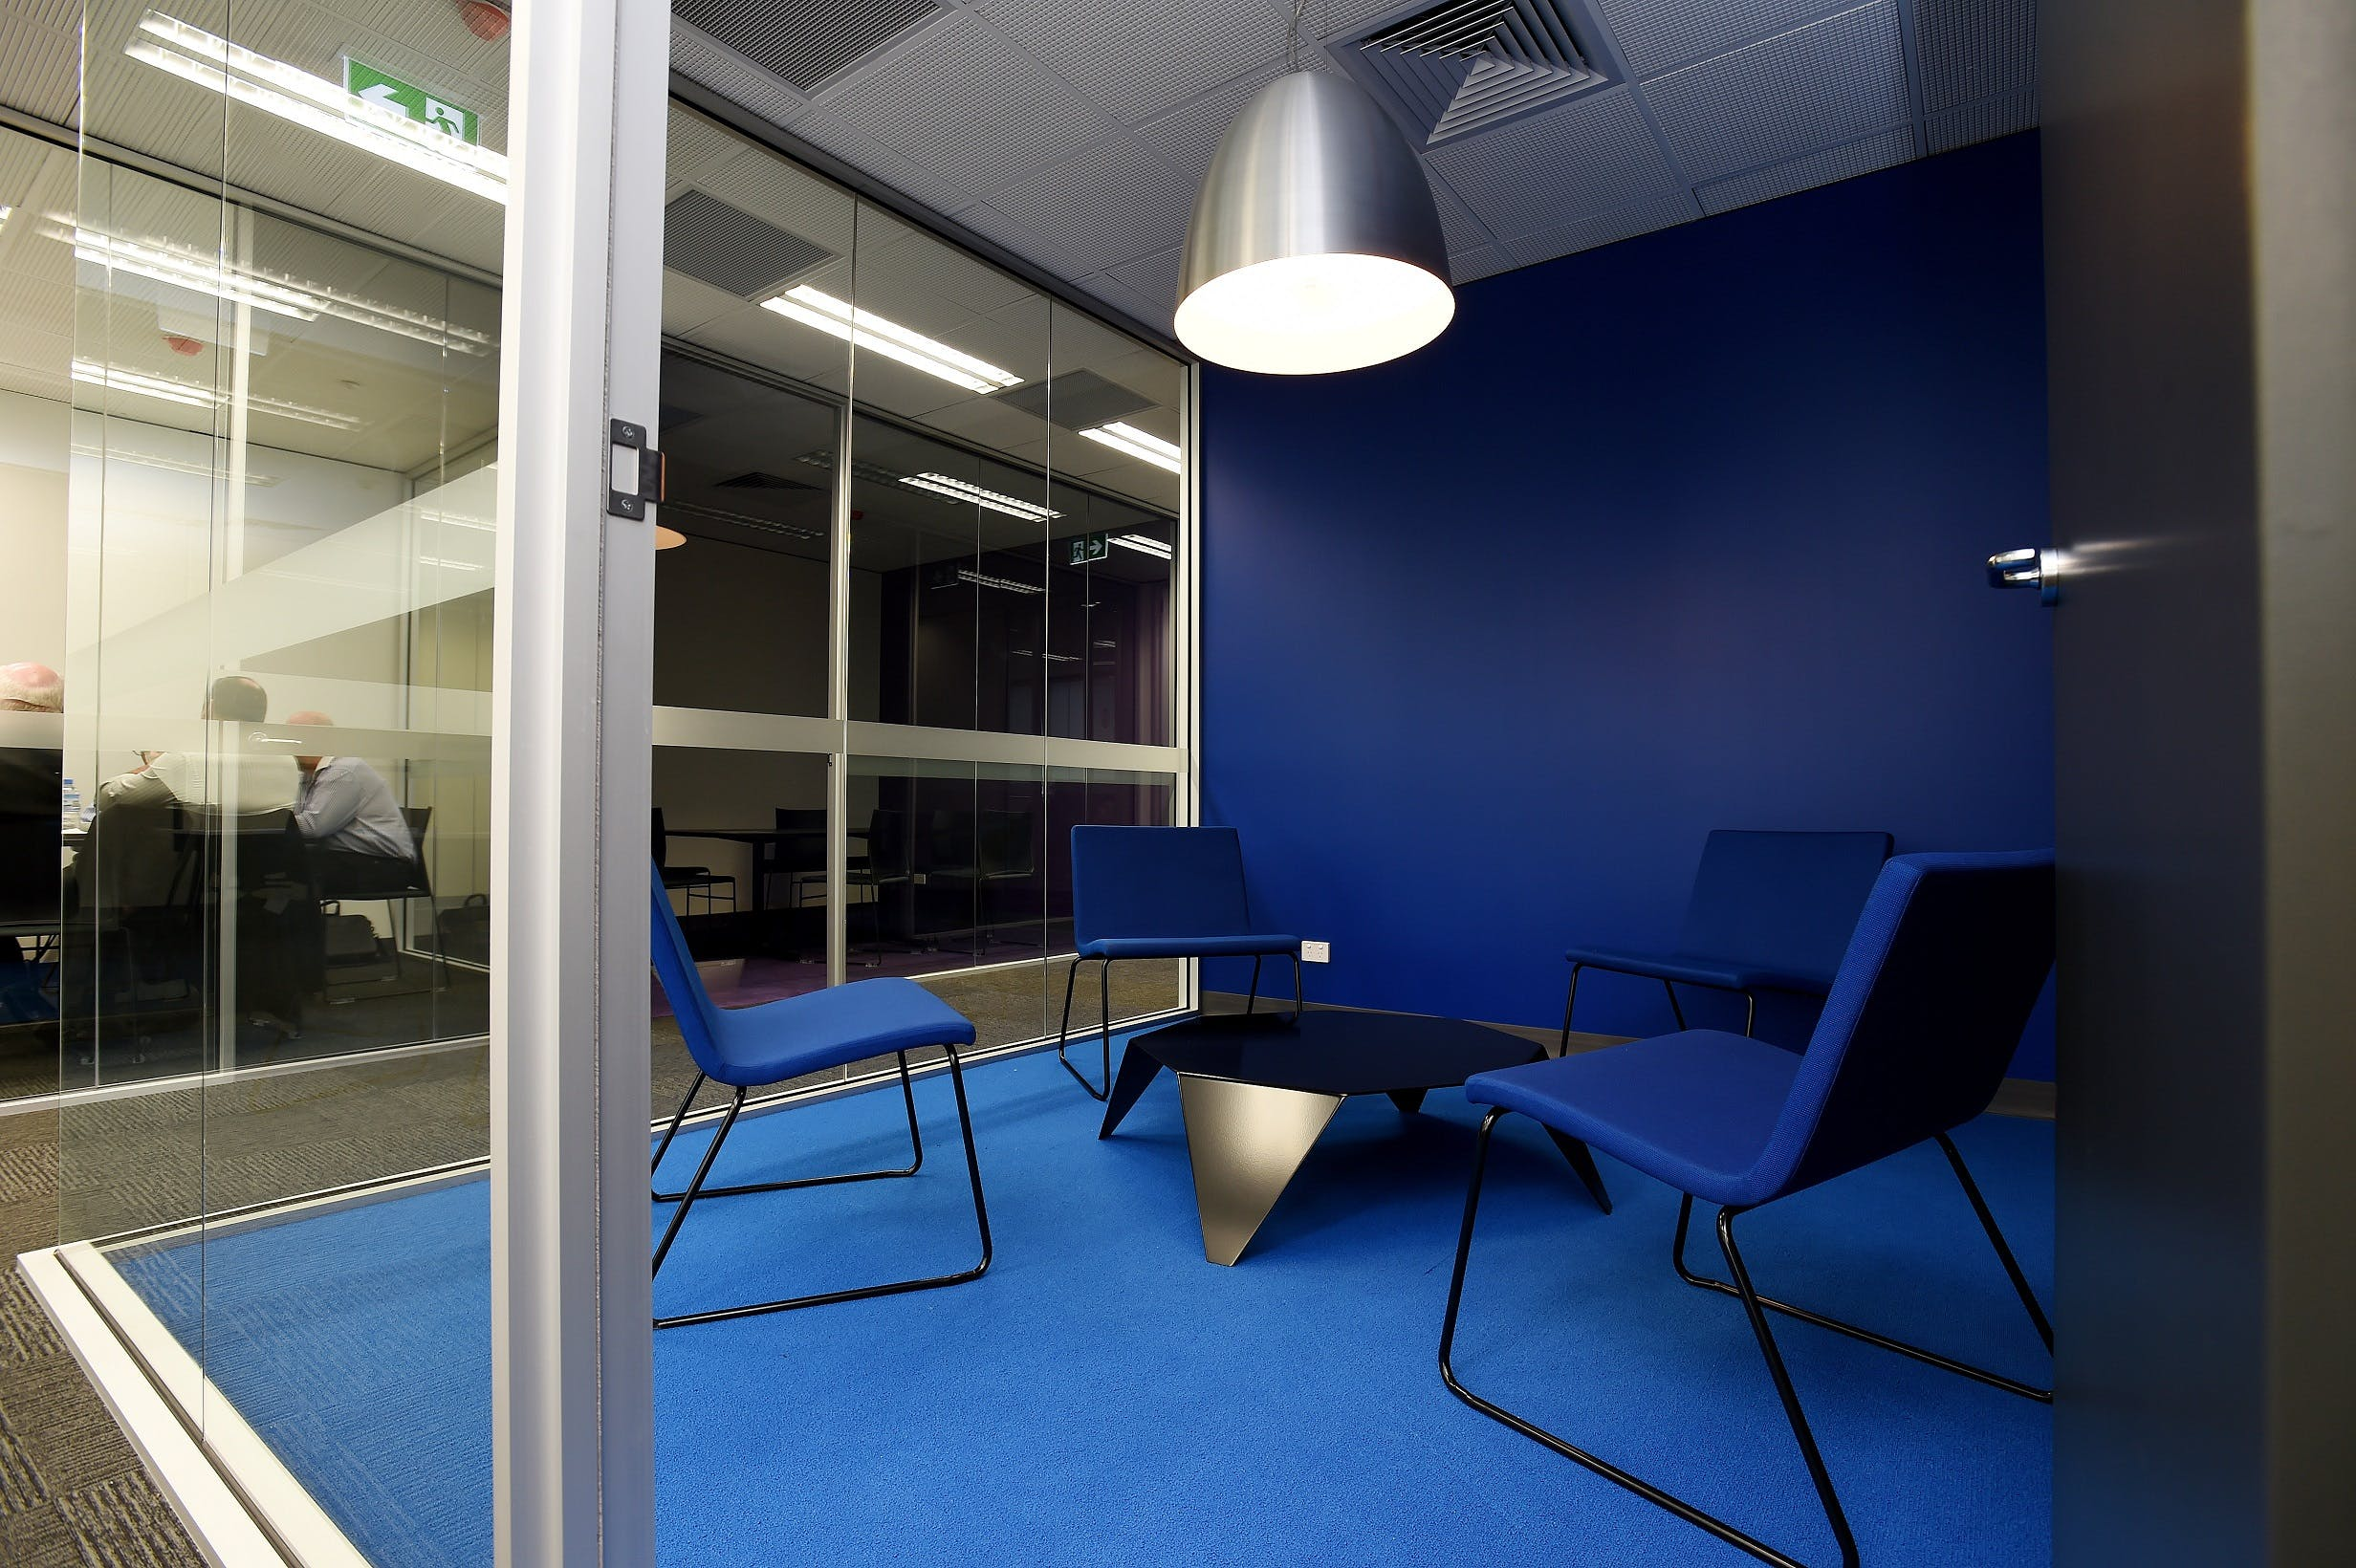 Meeting Room 4, meeting room at CO-HAB Tonsley, image 1